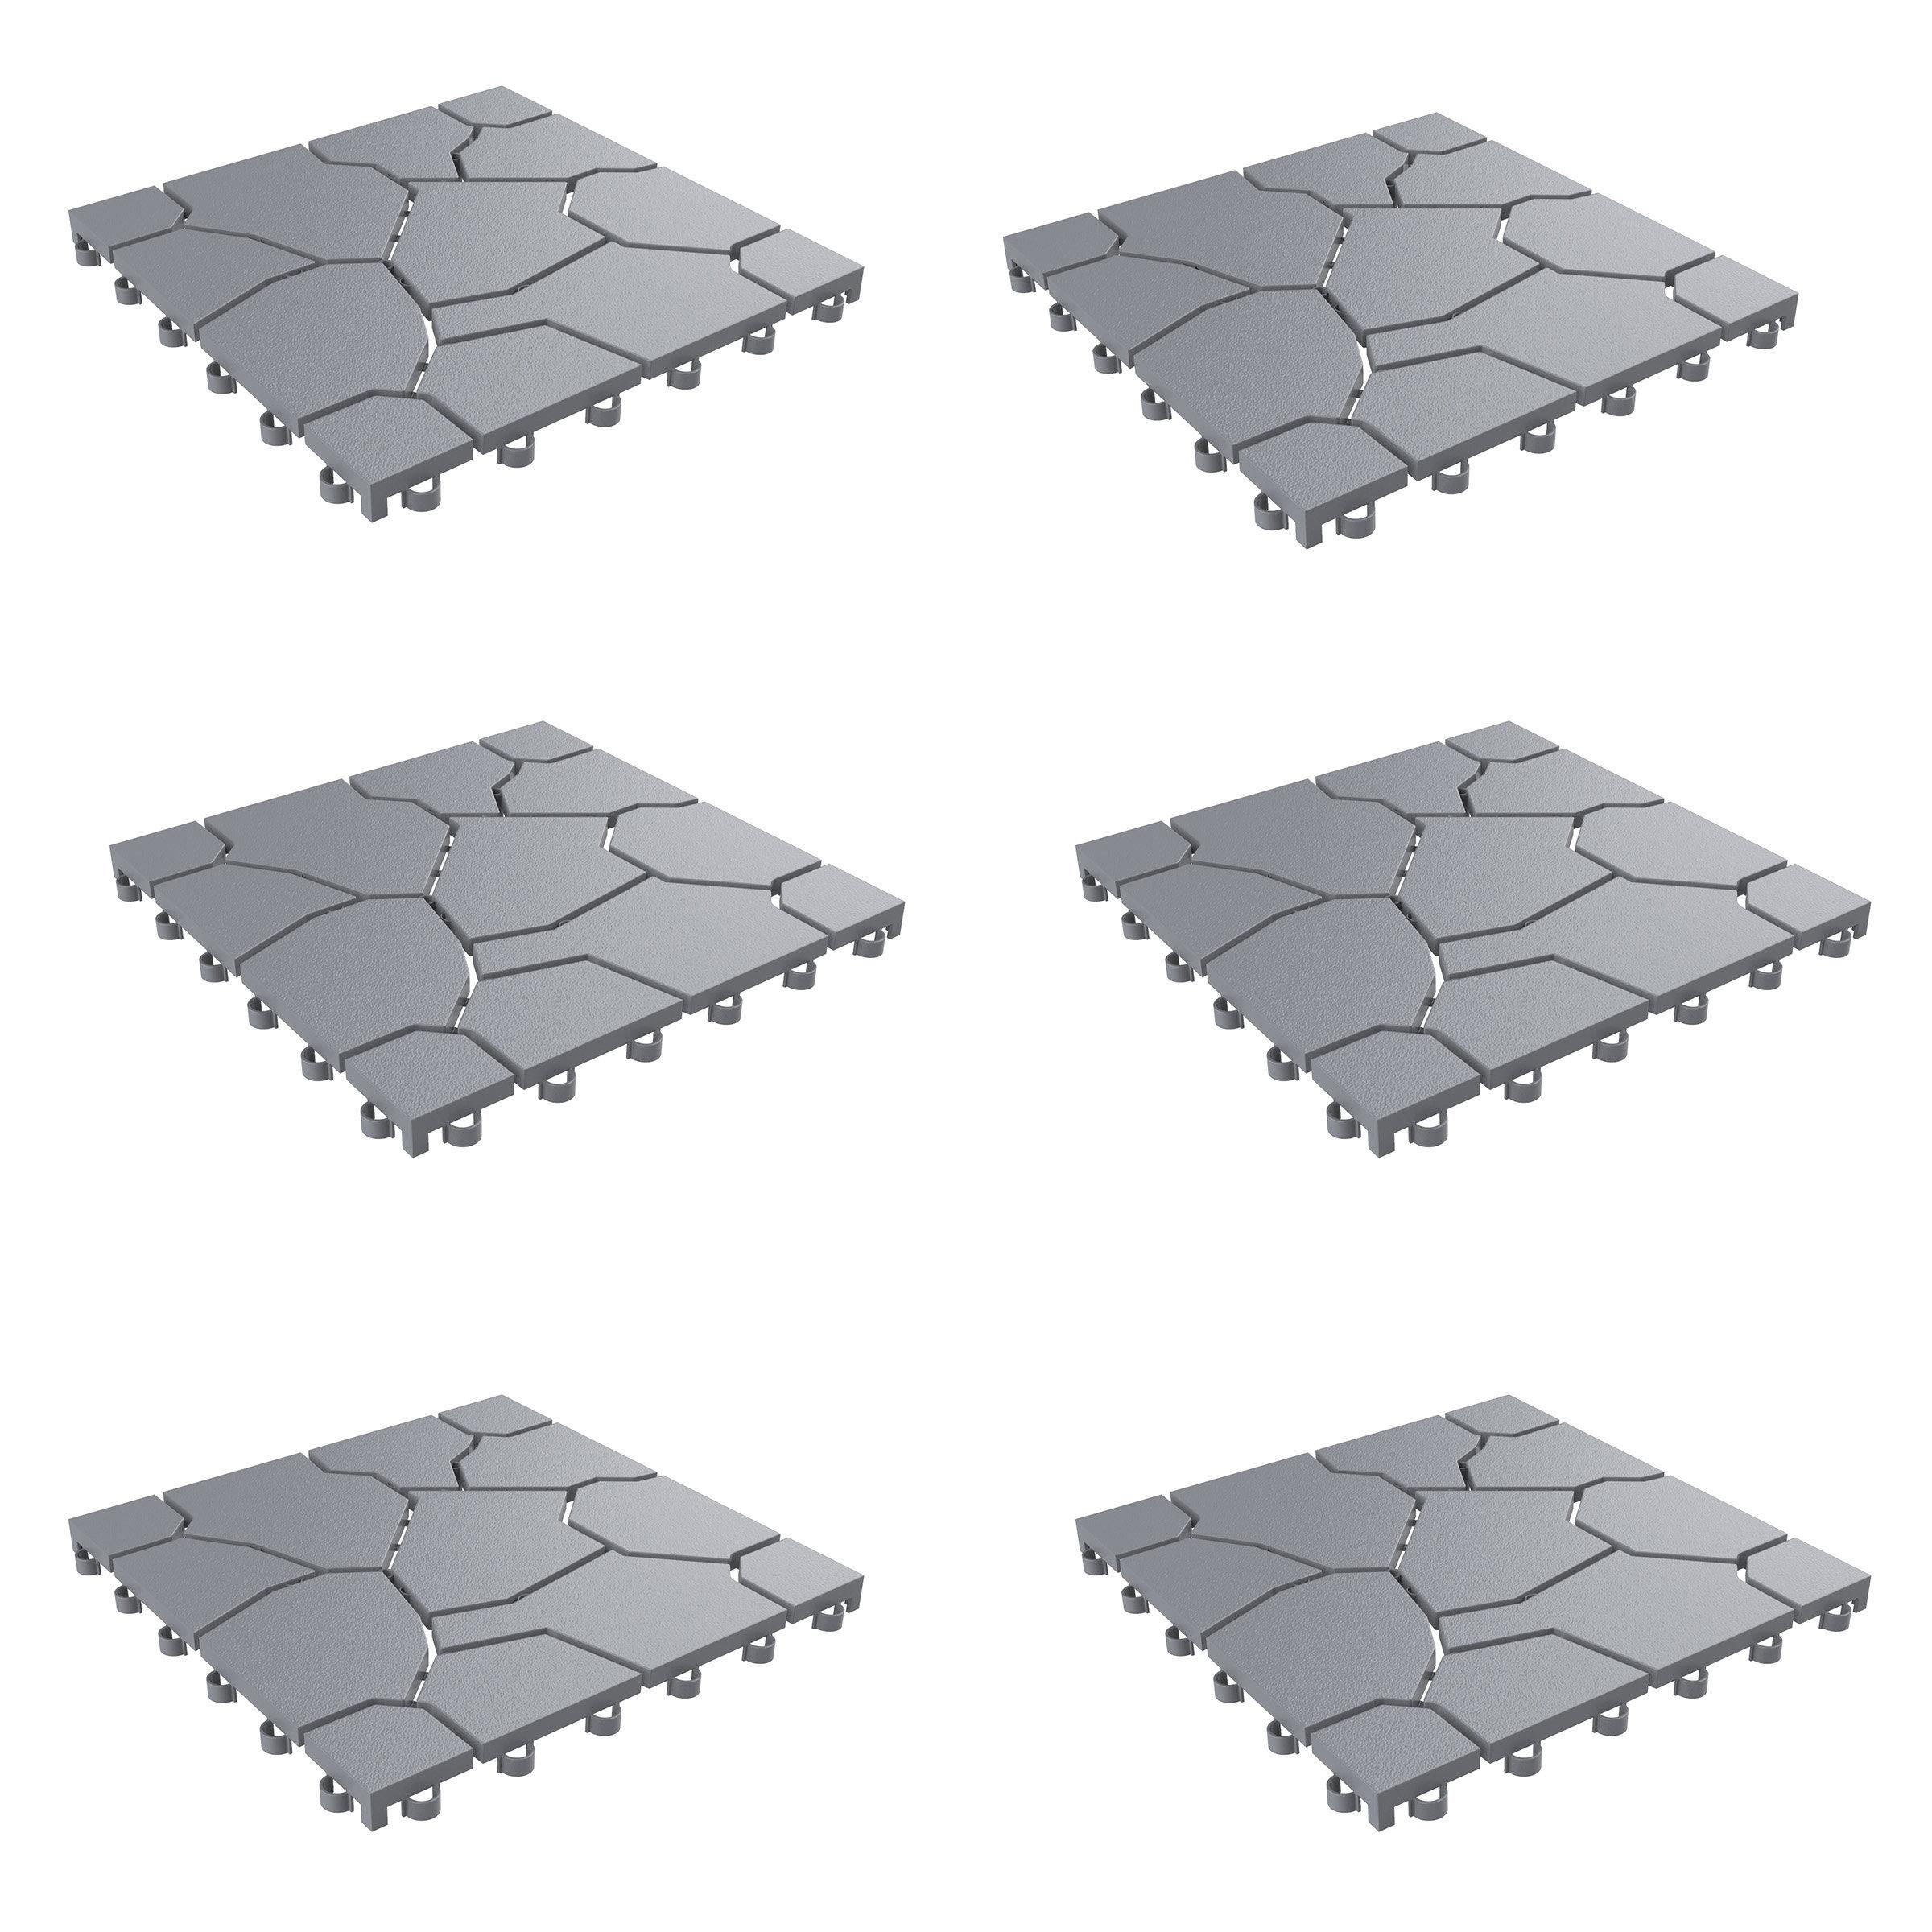 amazoncom interlocking pavers - 679×679